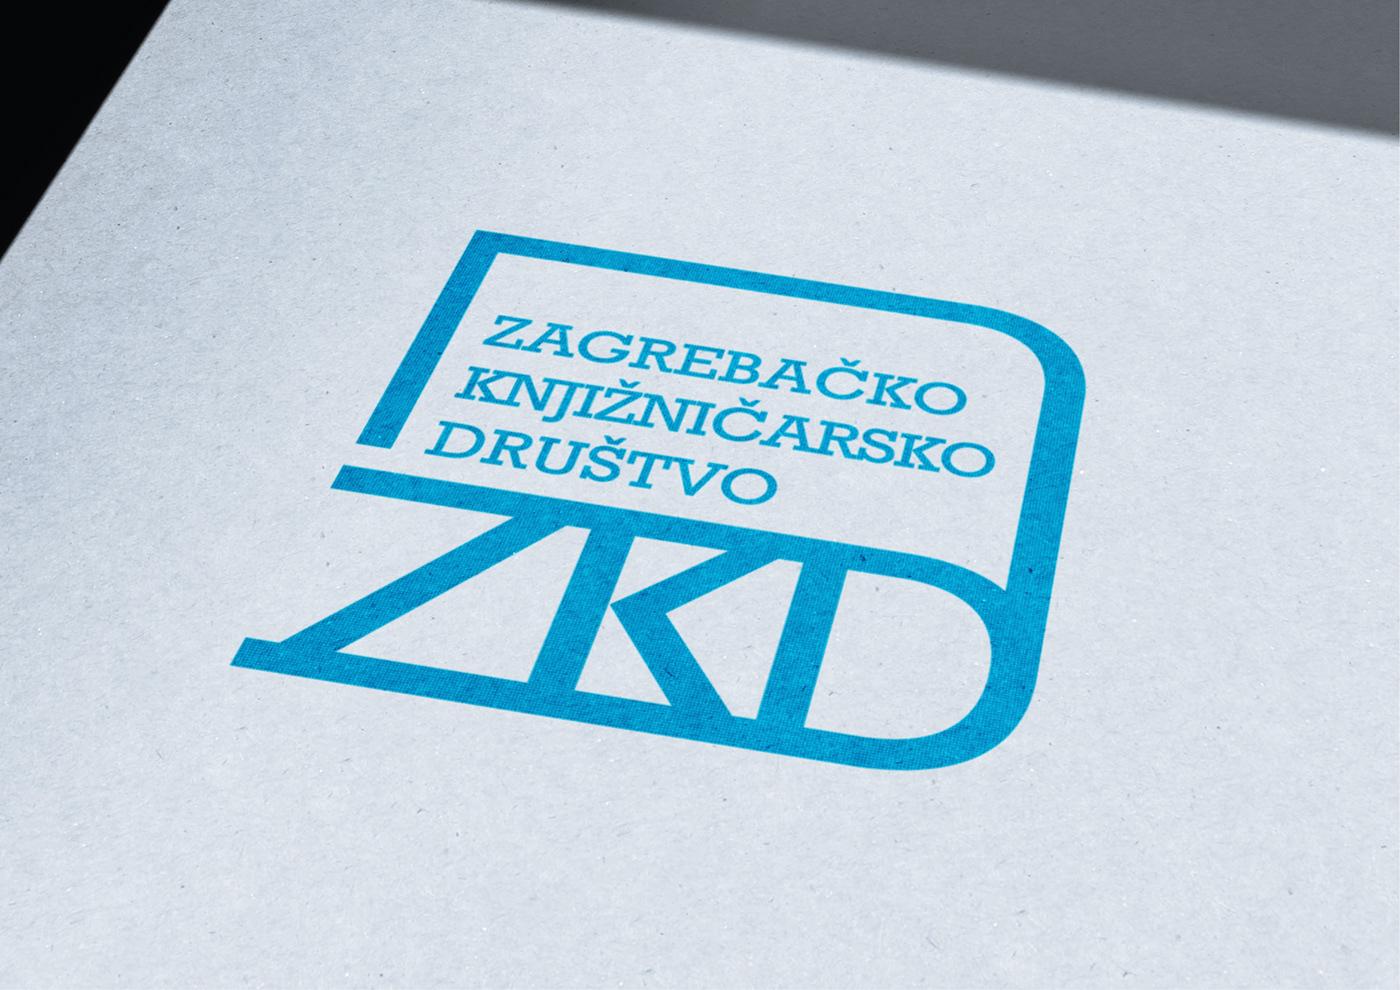 visual identity logo sign Logotype